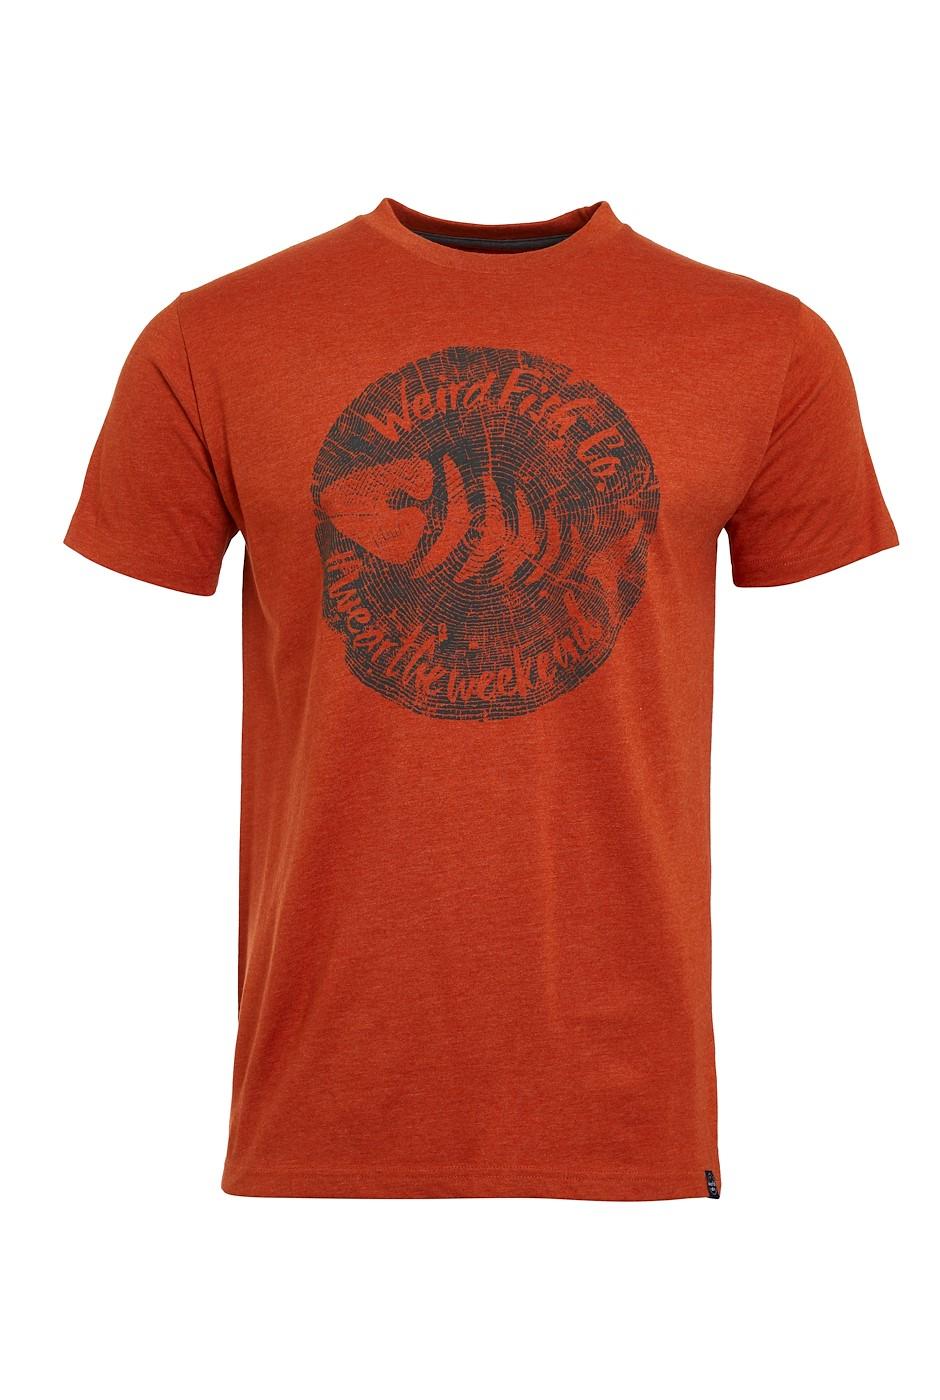 Woodcut Eco Graphic T-Shirt Rust